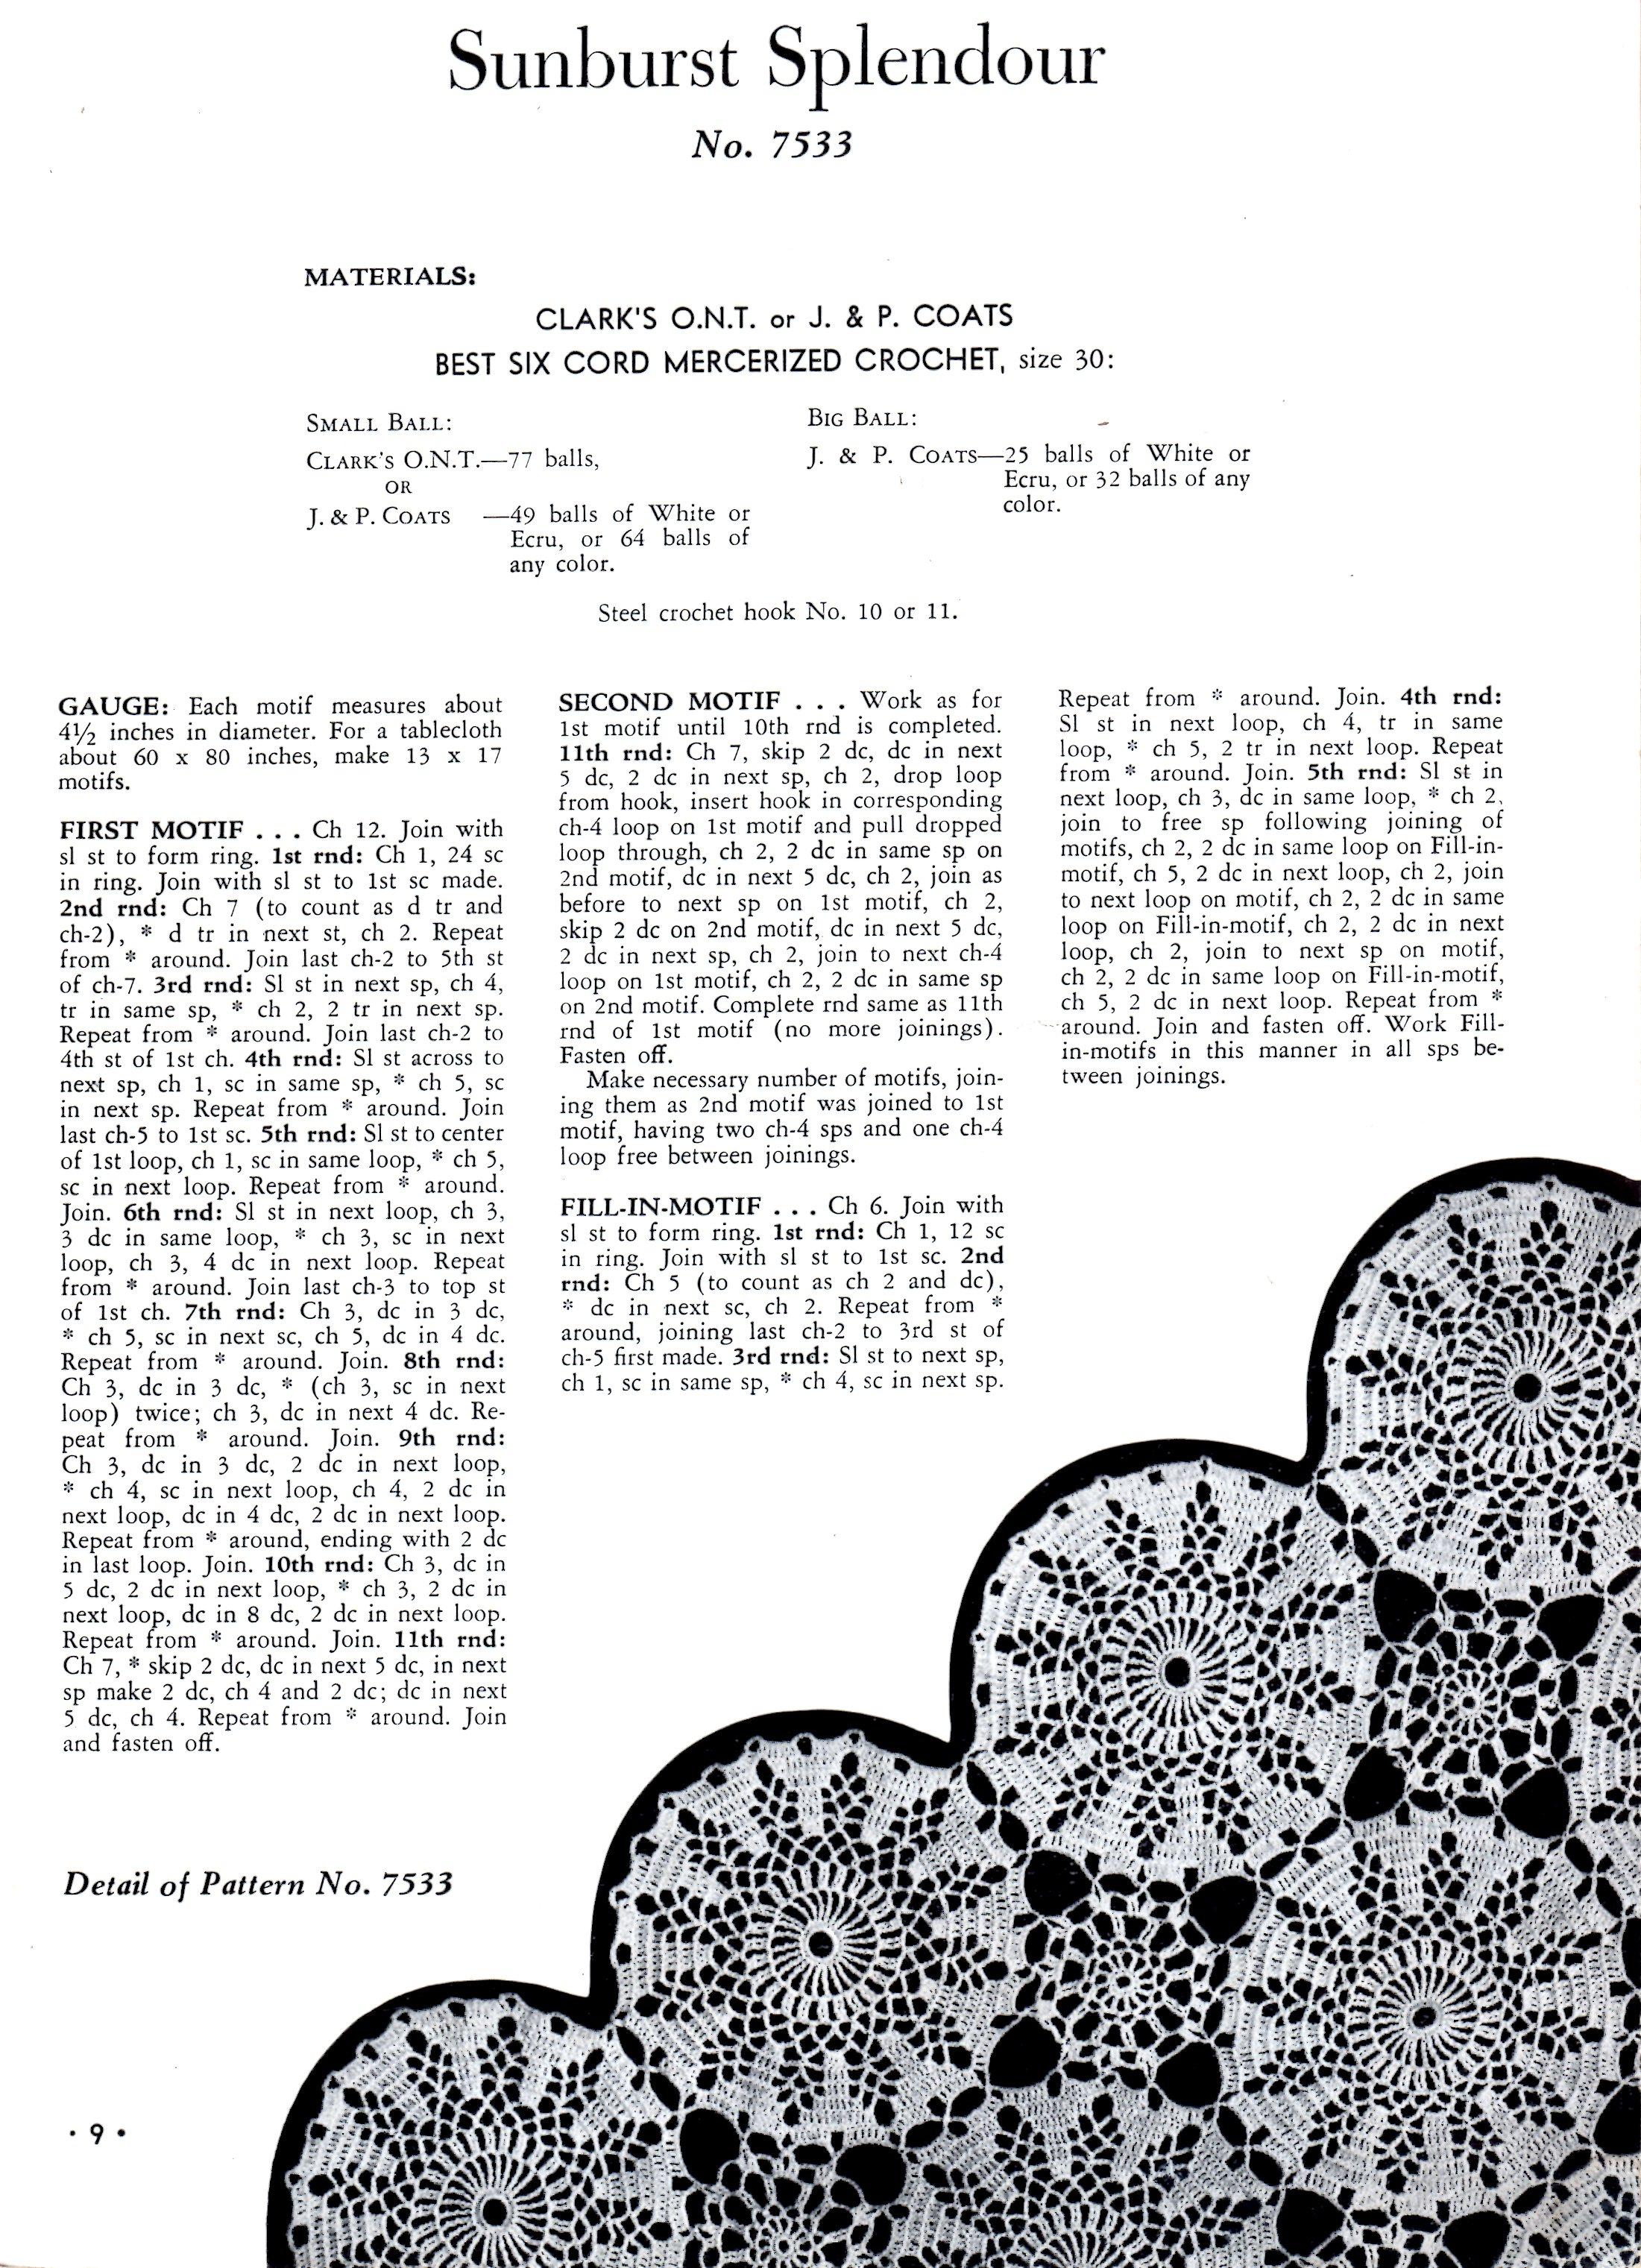 Crochet tablecloth pattern sunburst splendour lacy motifs crochet tablecloth pattern sunburst splendour motif instructions bankloansurffo Gallery